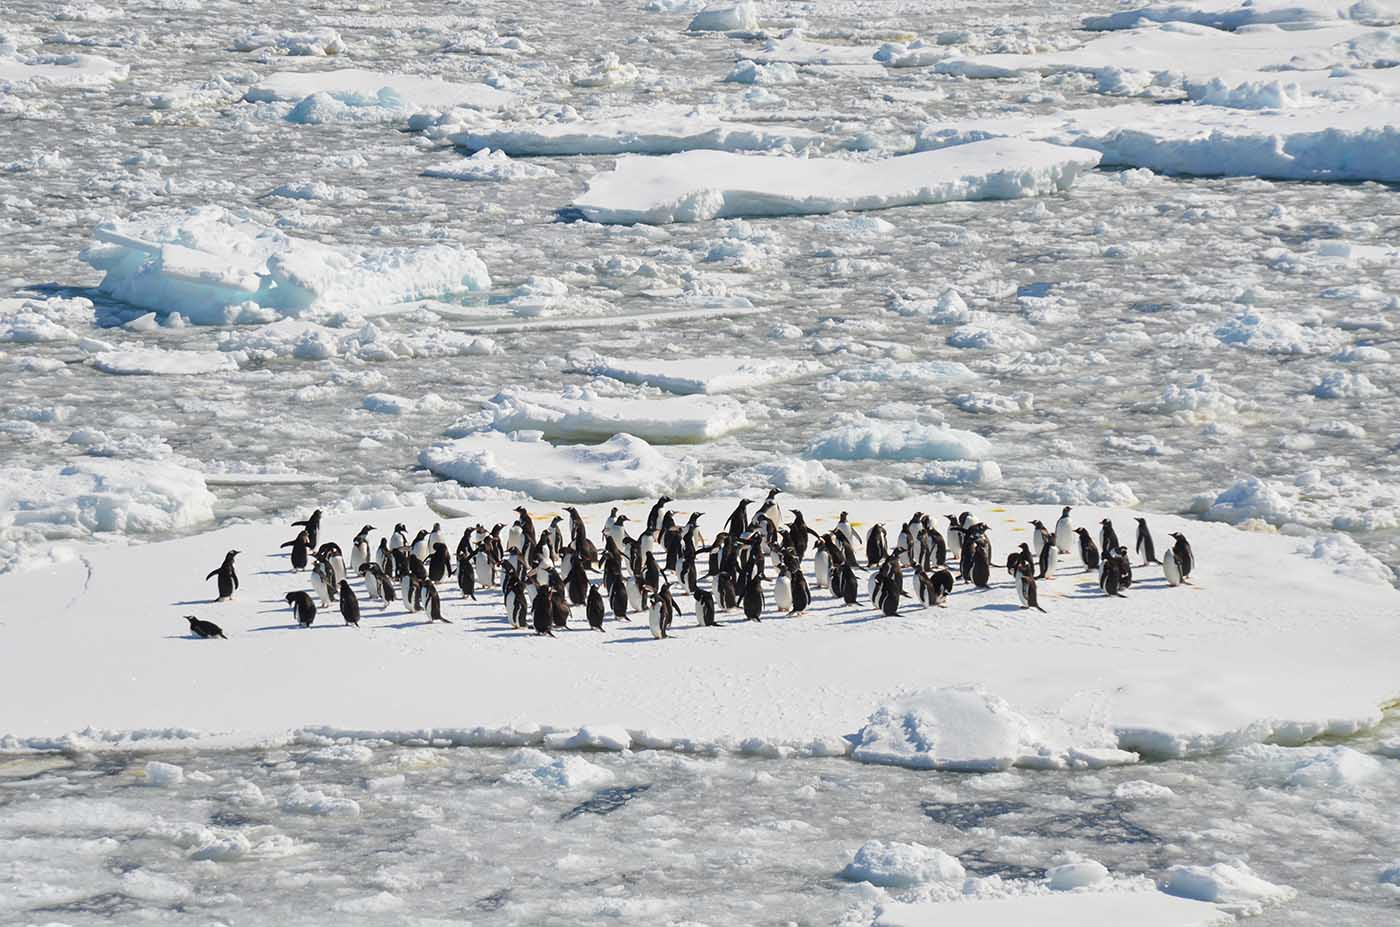 nuevas colonias de pingüinos